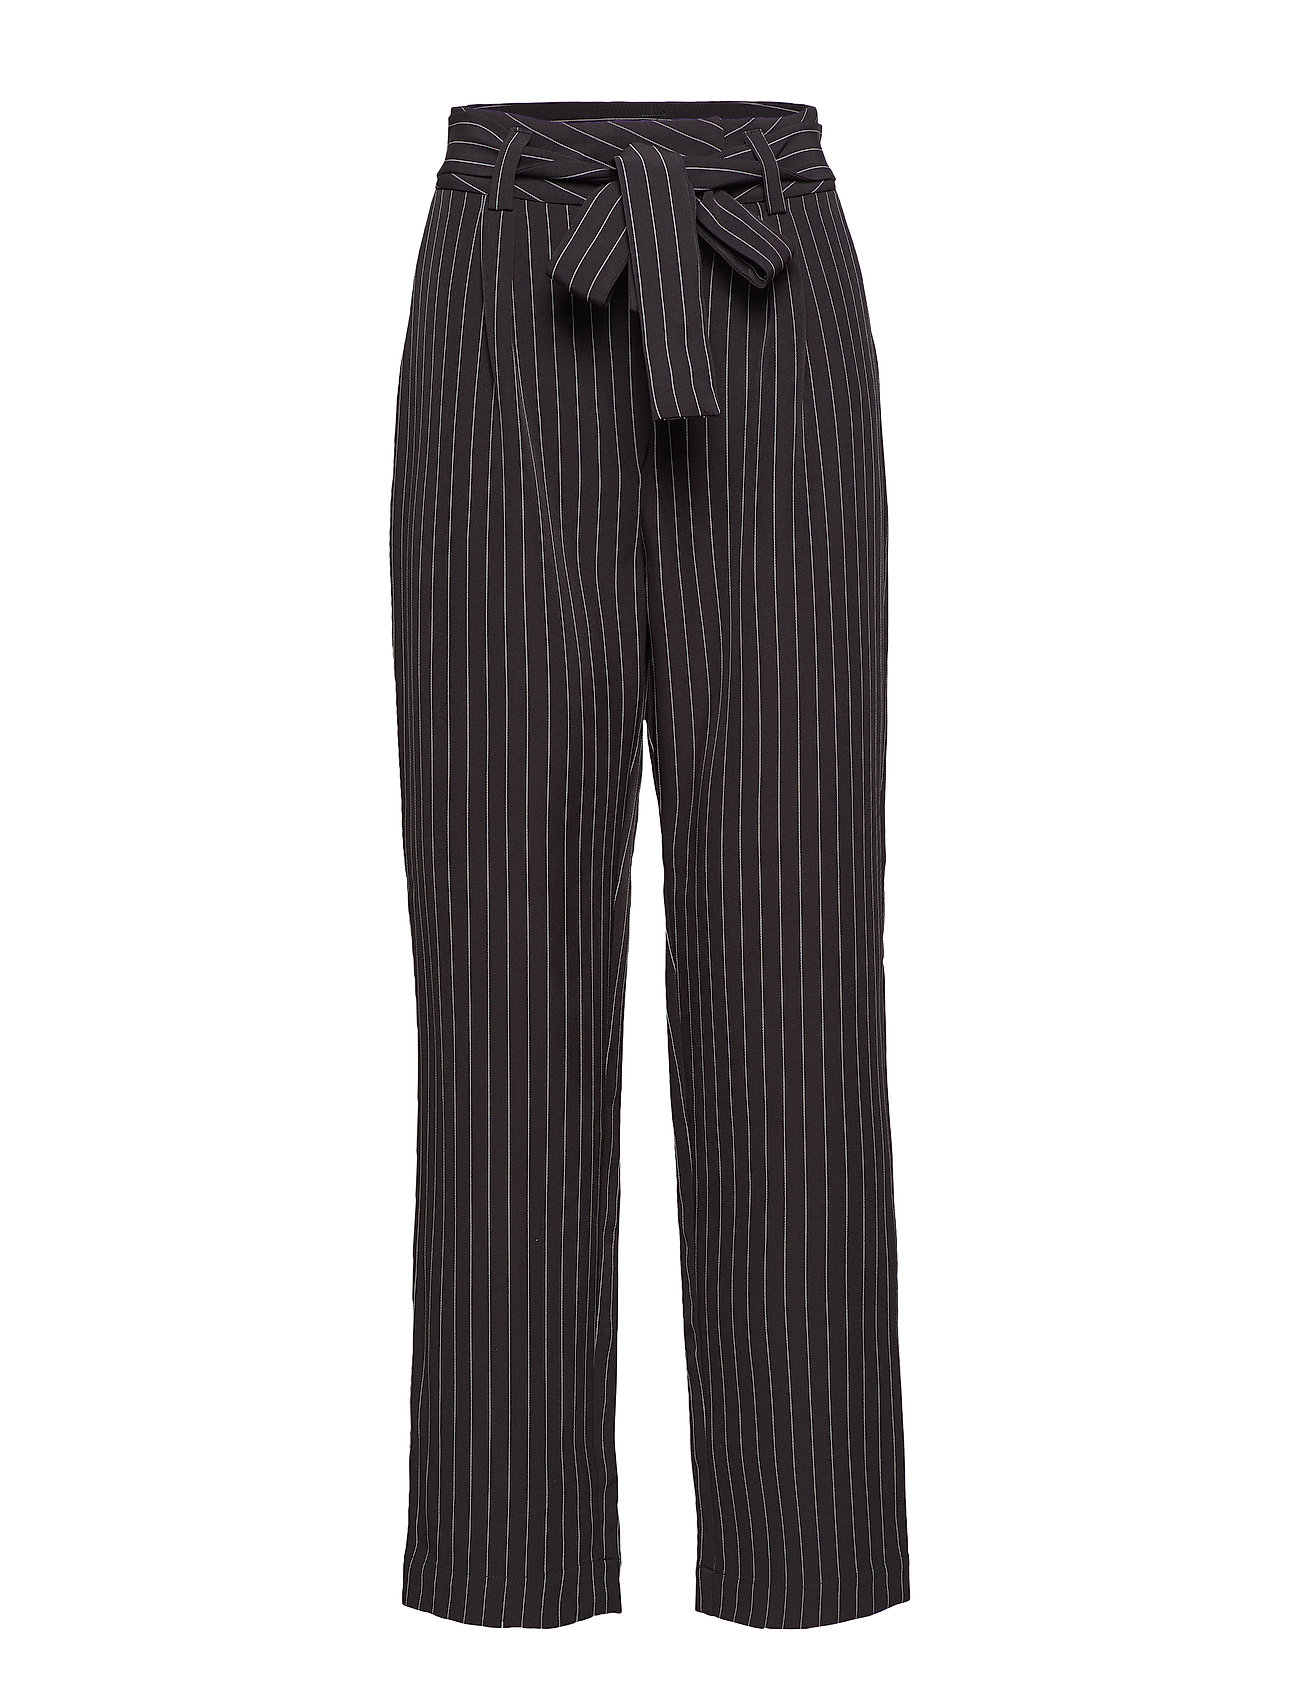 Gestuz Nala pants SO19 - BLACK PINSTRIPE